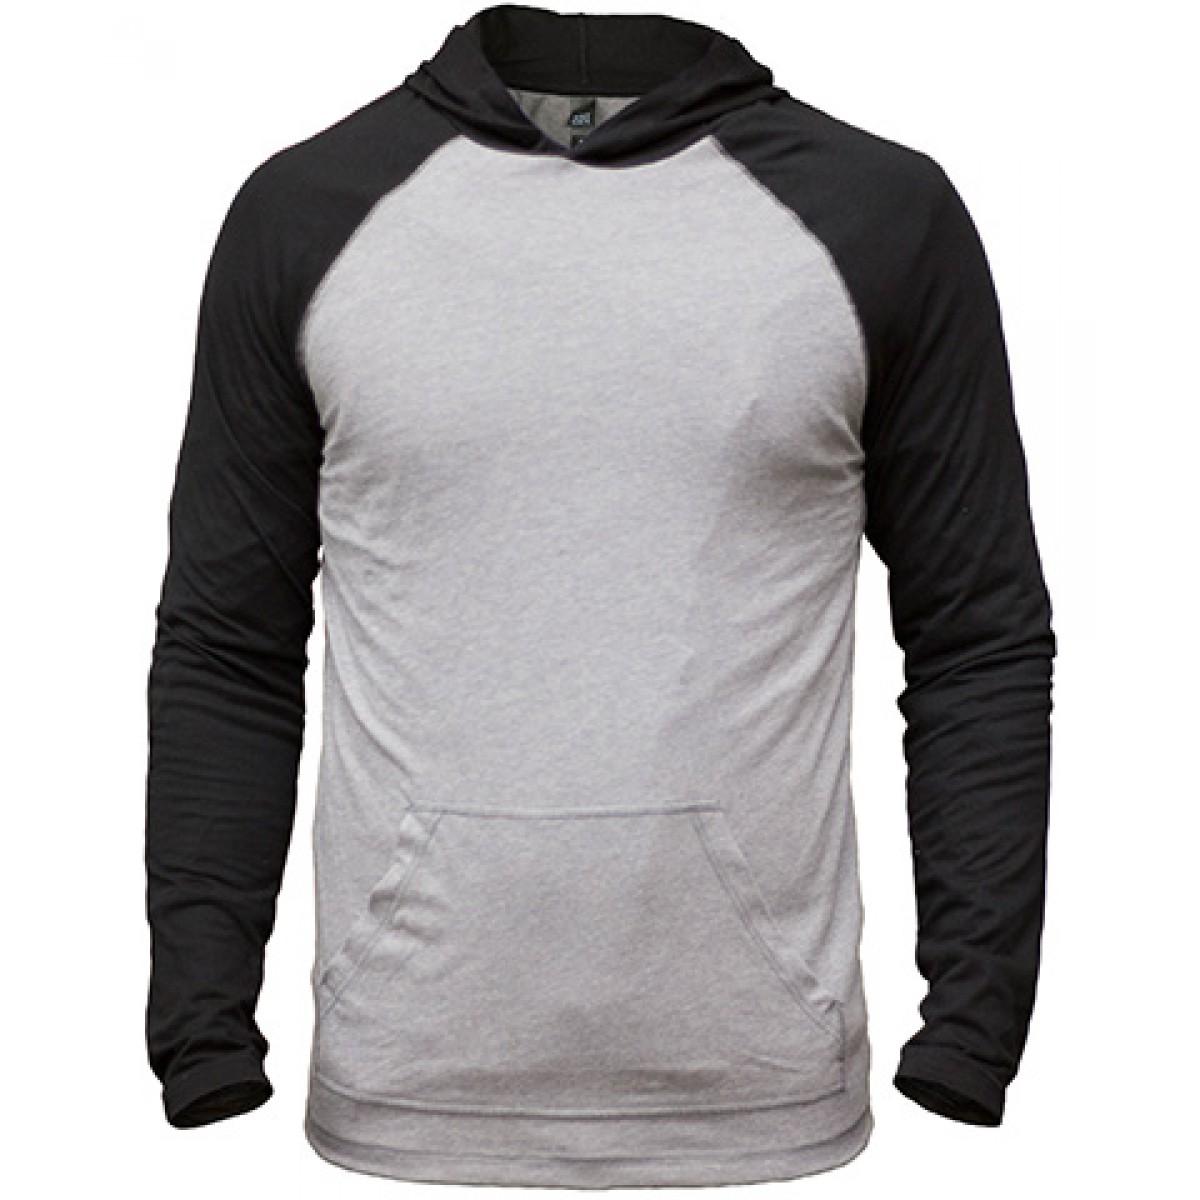 50/50 Raglan Hoodie-Gray/Black-L